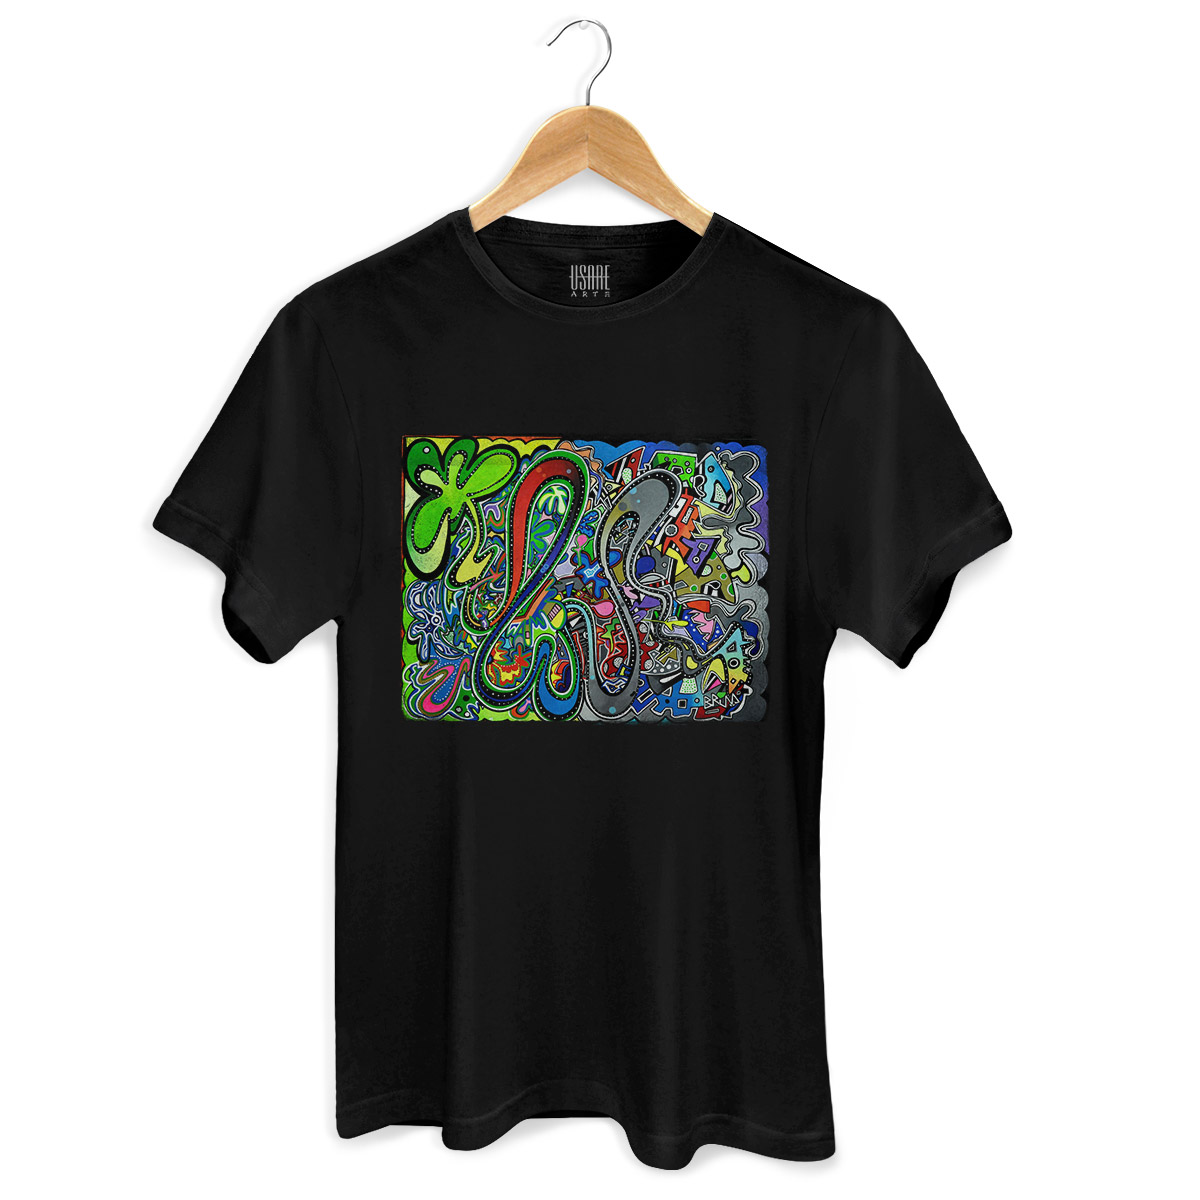 Camiseta Masculina Bruna Forest x City